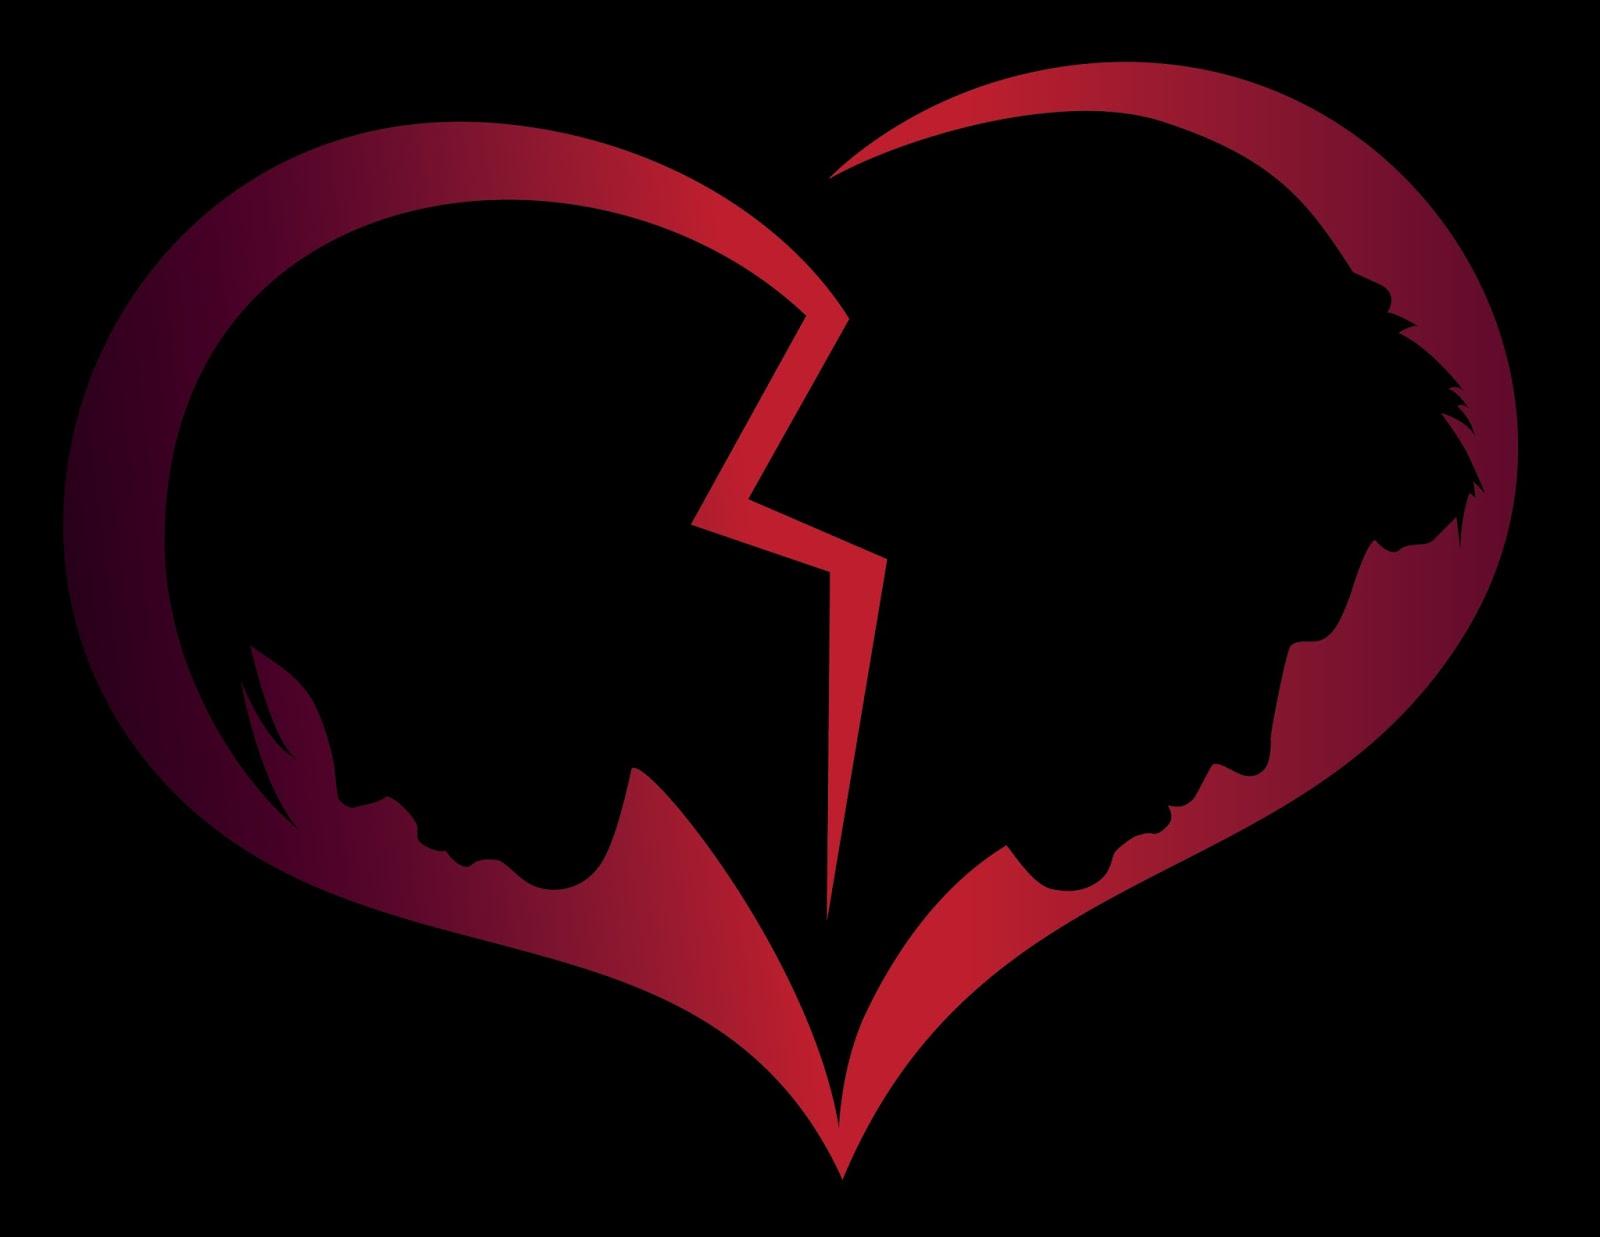 love images hd download broken heart full hd pictures stills